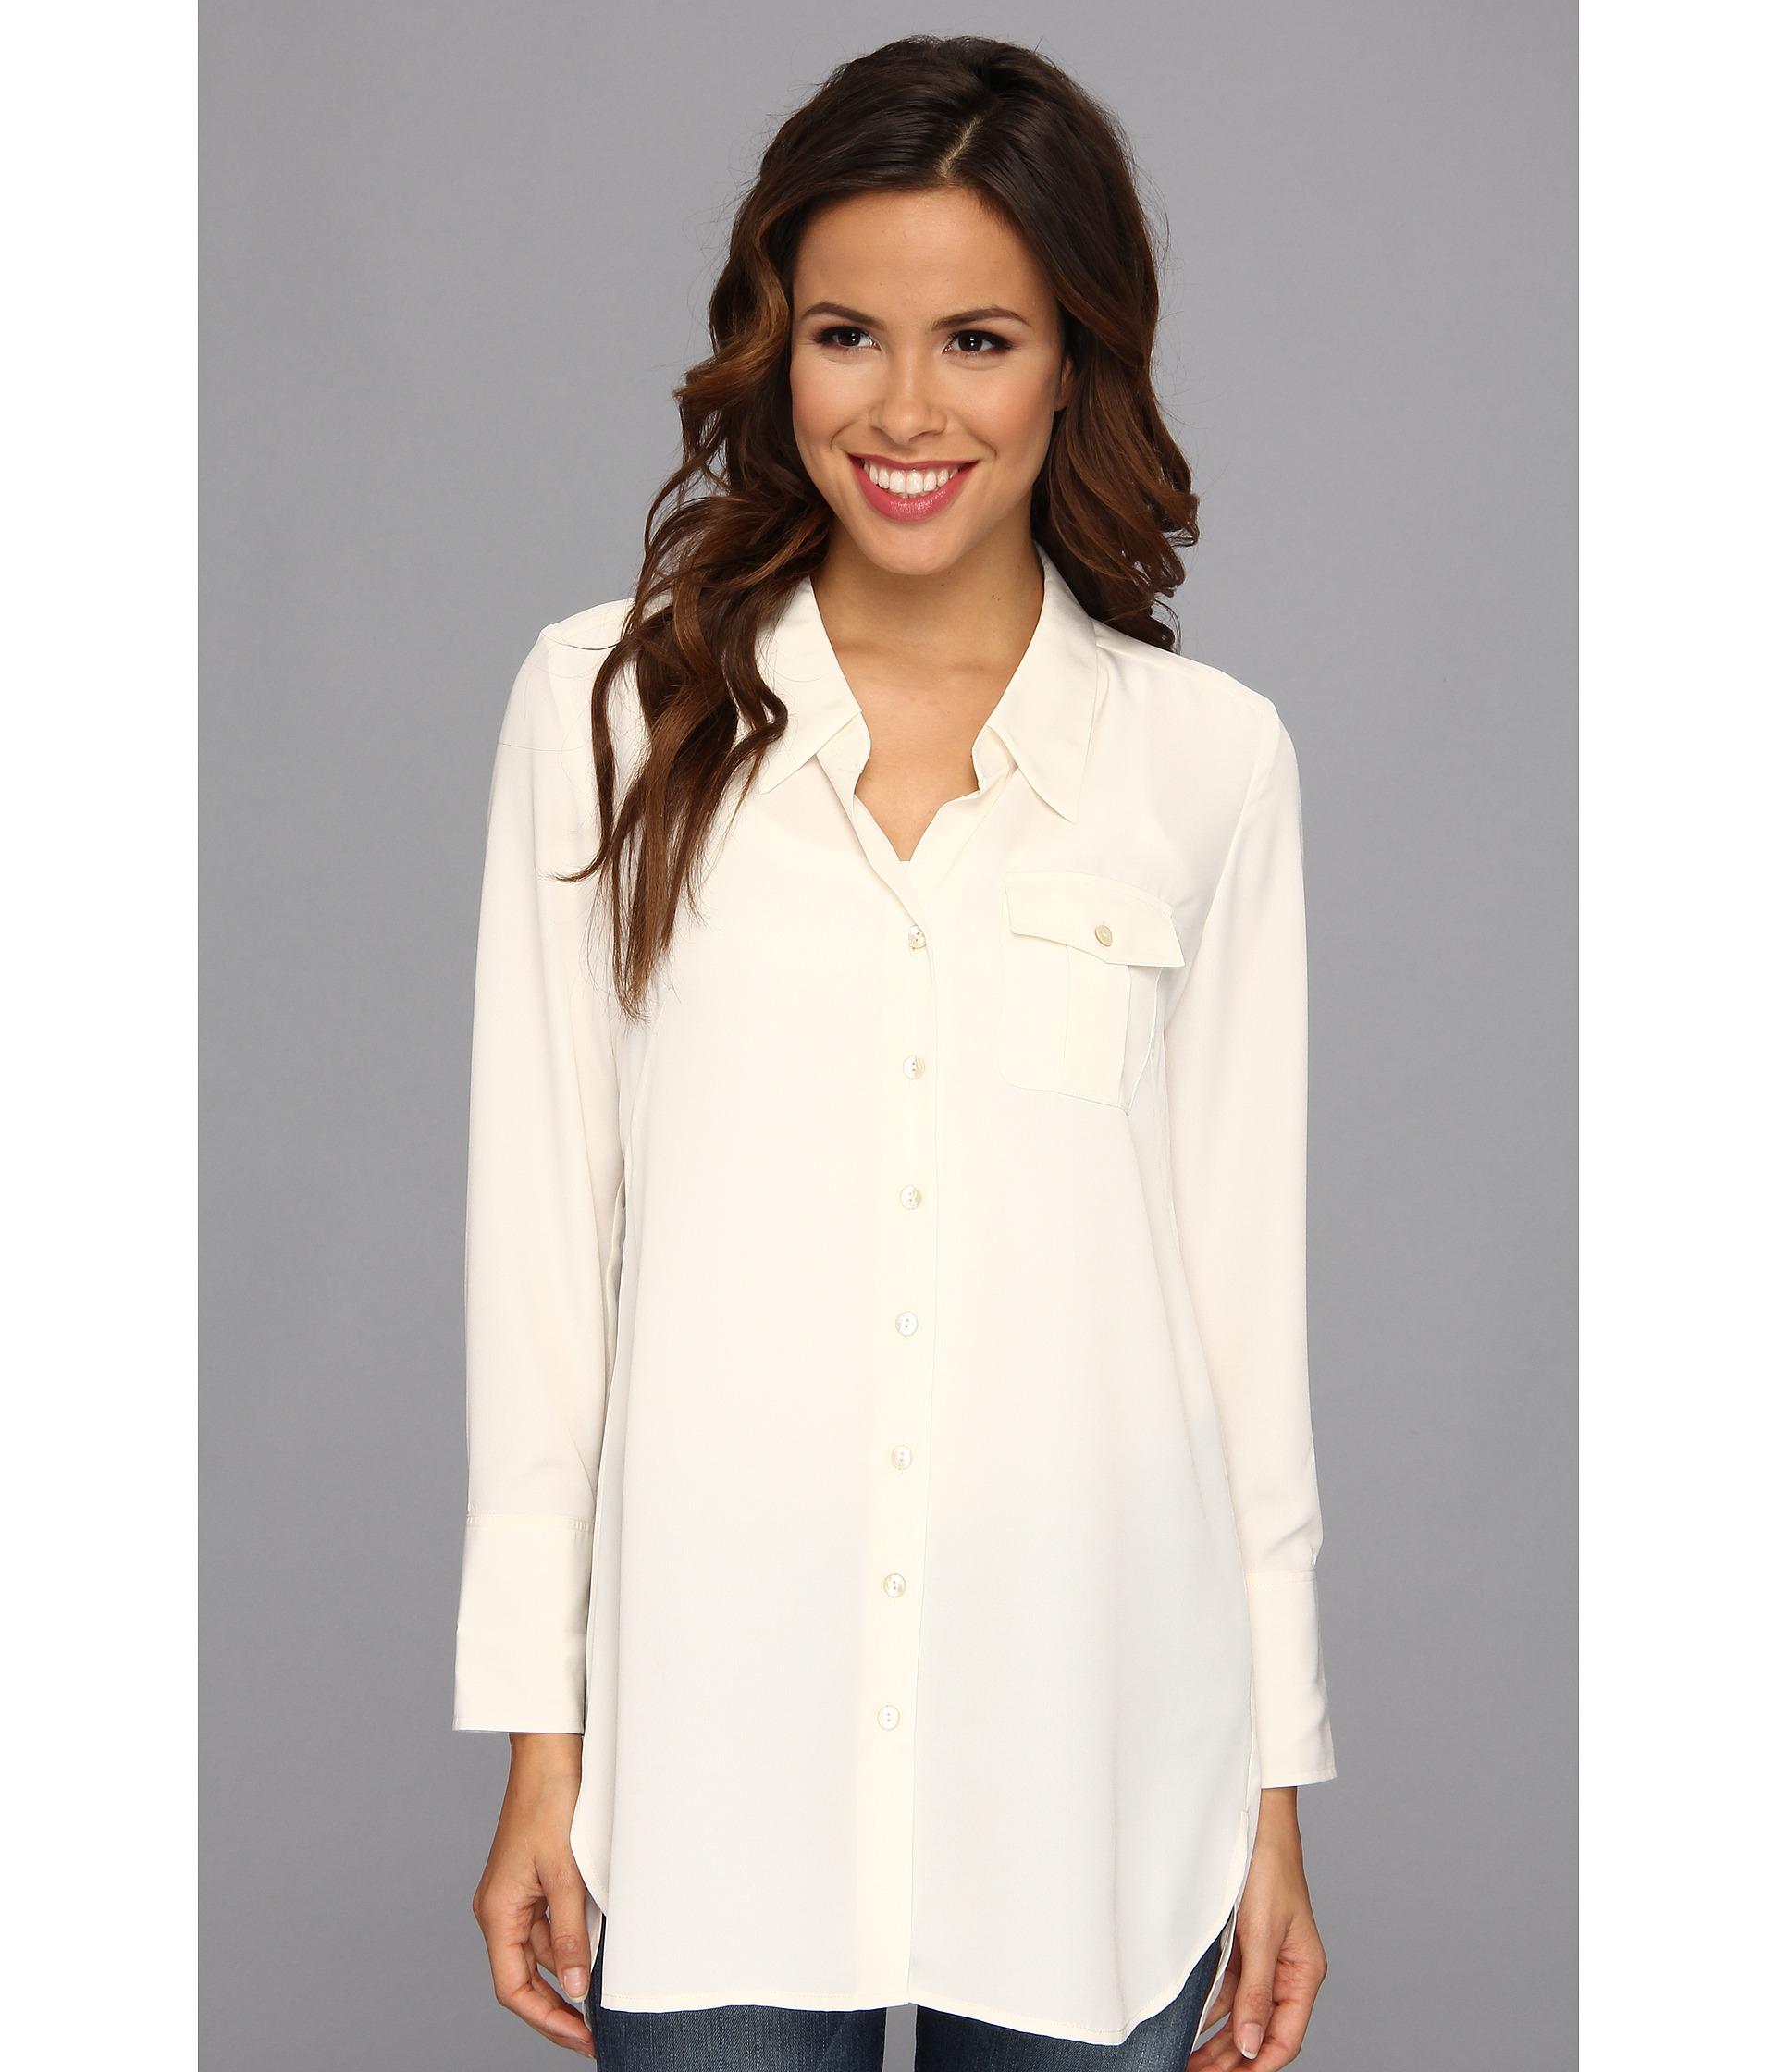 b3258b897 Lyst - NIC+ZOE Cool Mist Shirt in White